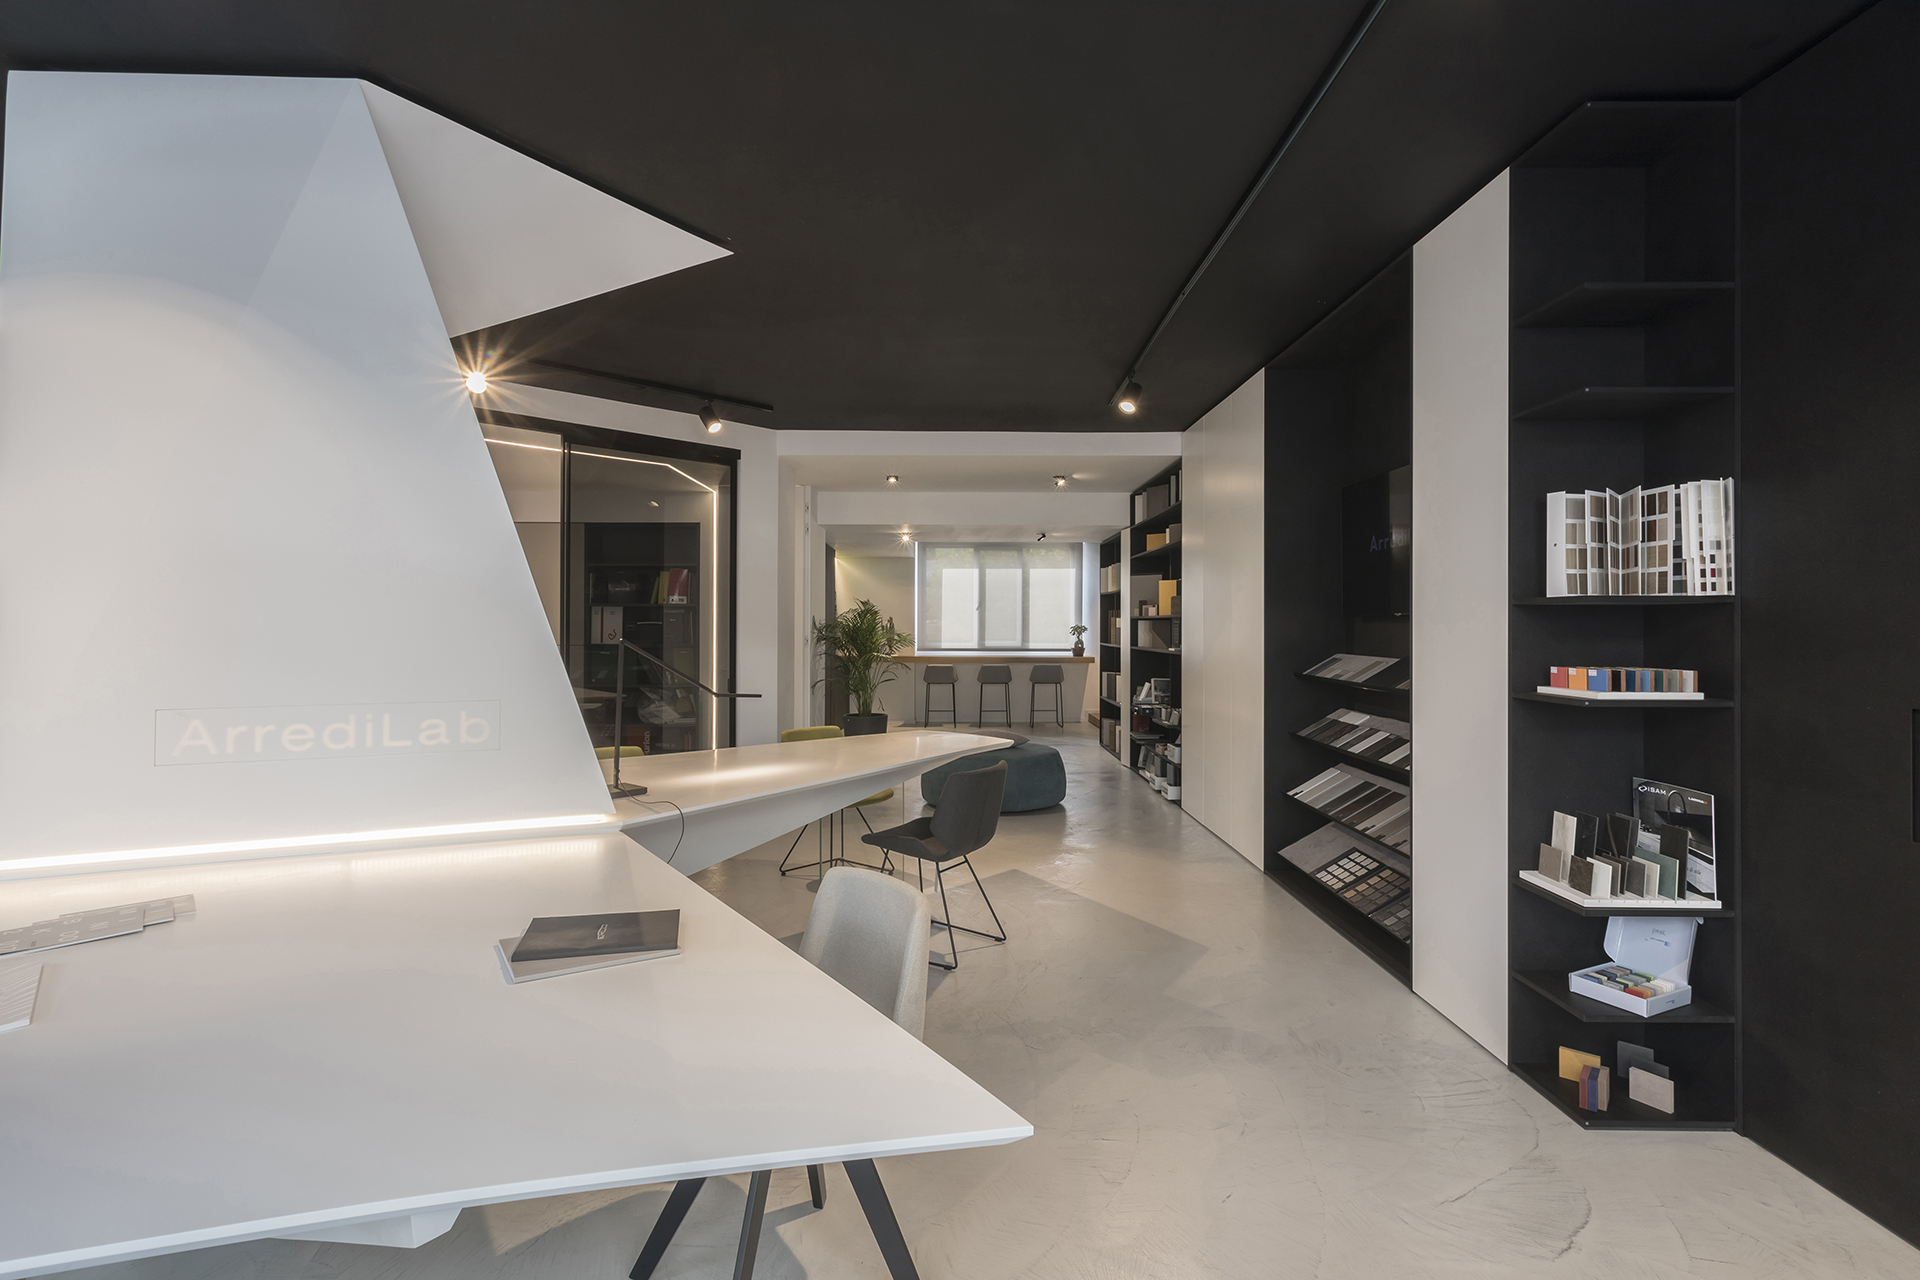 DFG-Architetti-Associati_showroom-Arredi-Lab-7